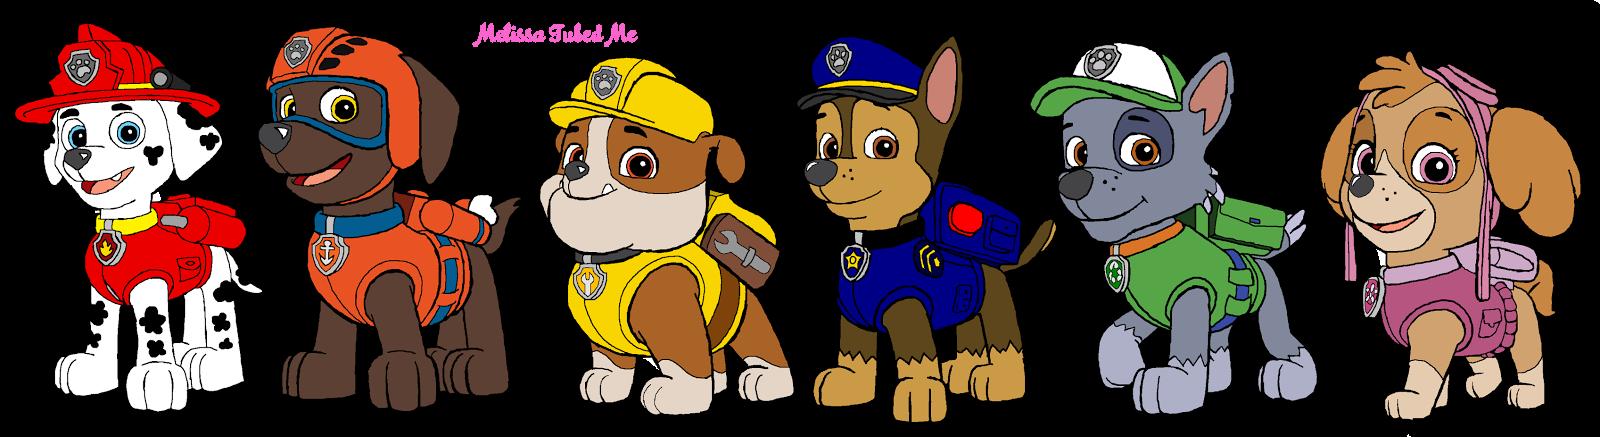 Halloween paw patrol clipart free banner library download Paw patrol clipart skye - ClipartFest banner library download